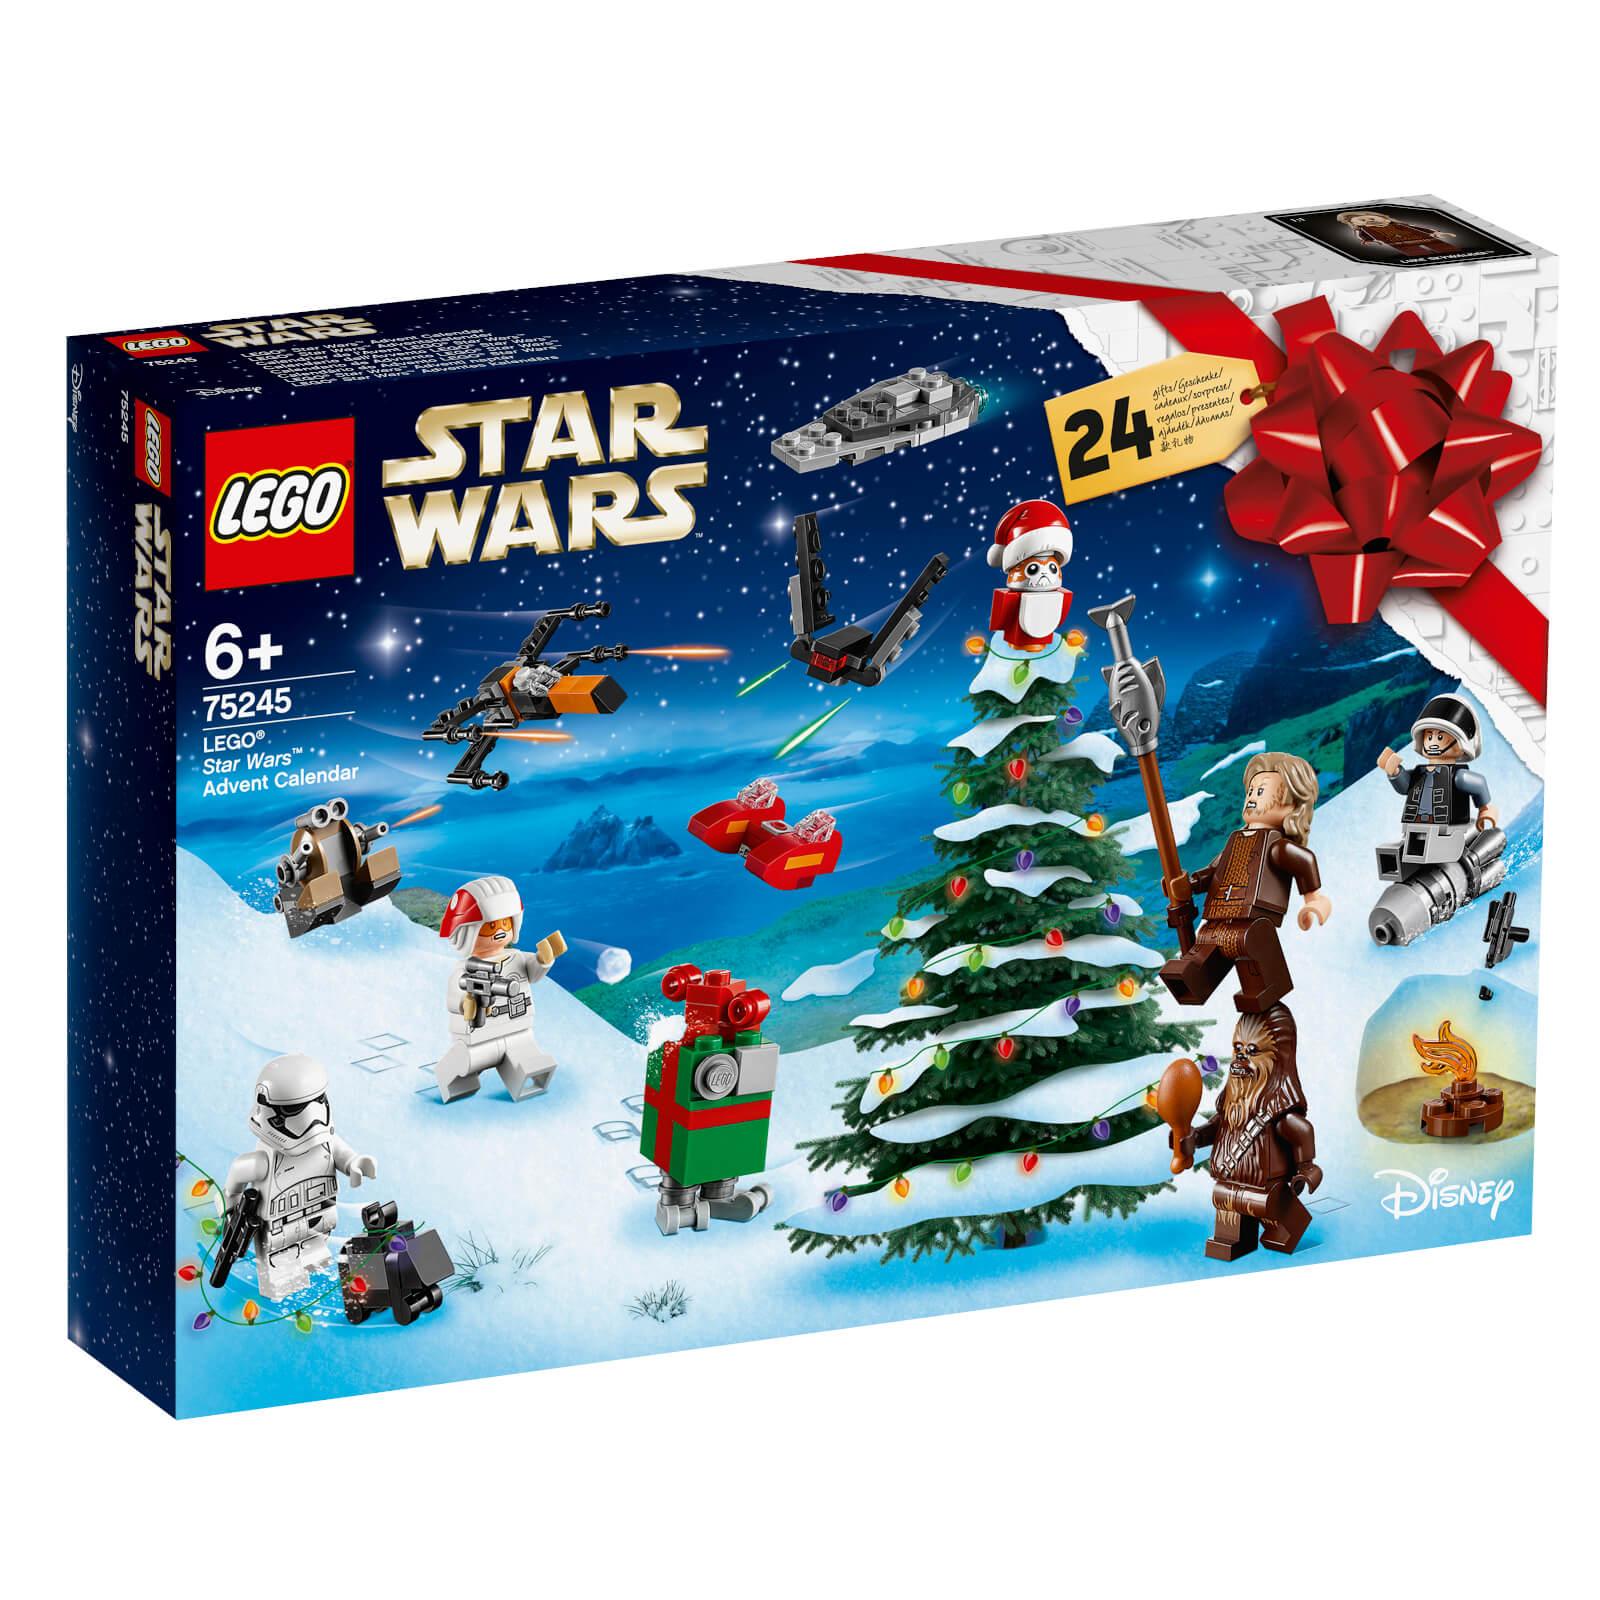 LEGO Star Wars Adventskalender 2019 | & LEGO City Adventskalender für 15,99€